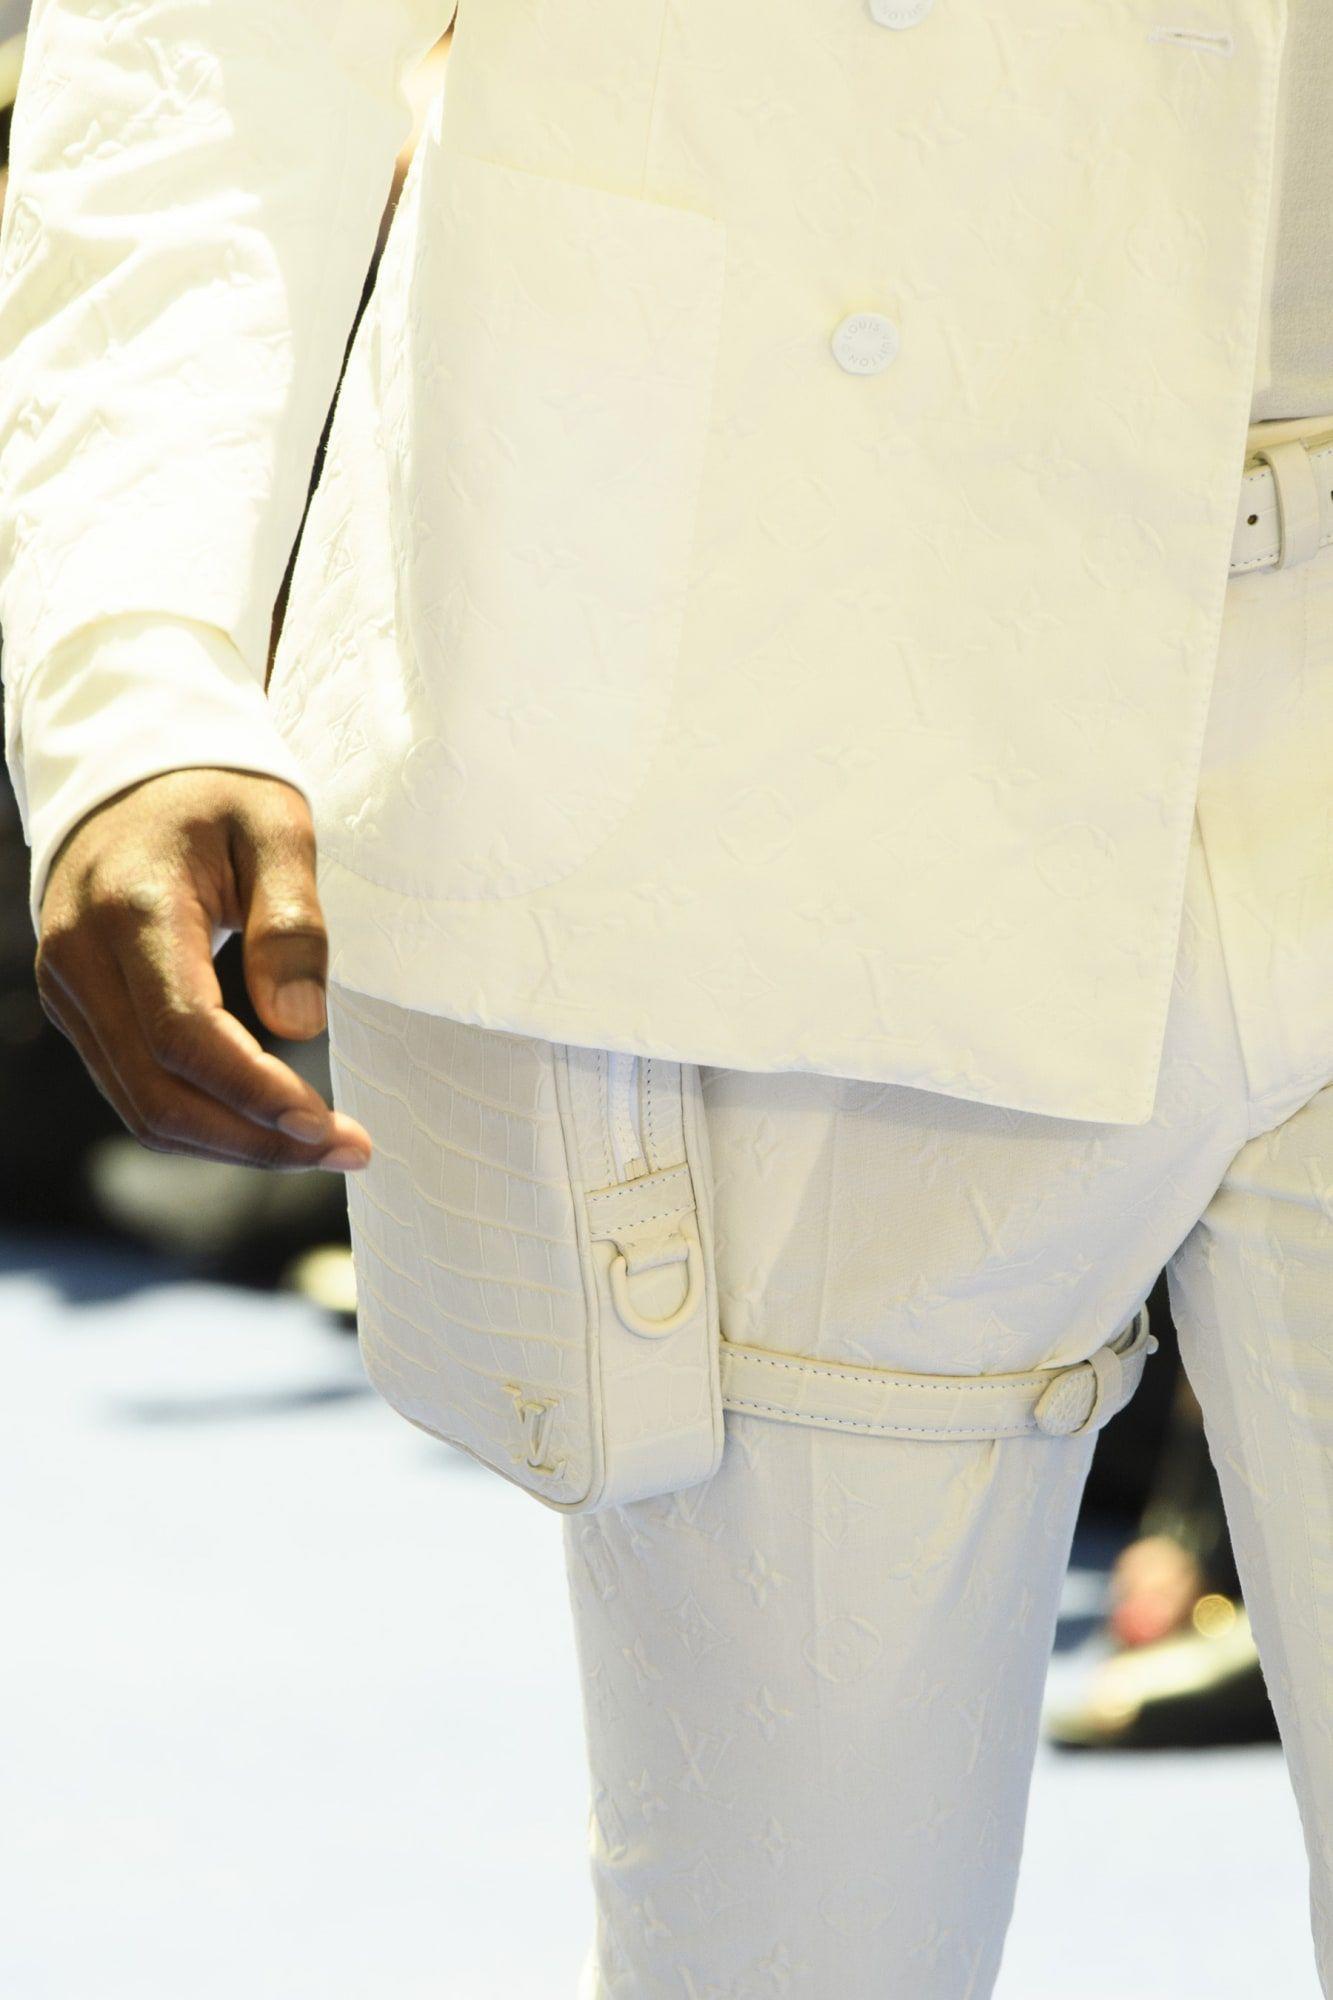 854bd967b6b Virgil Abloh Louis Vuitton Men s Spring Summer 2019 Sneakers Sunglasses  Bags Accessories - Fashionista  Mensaccessories